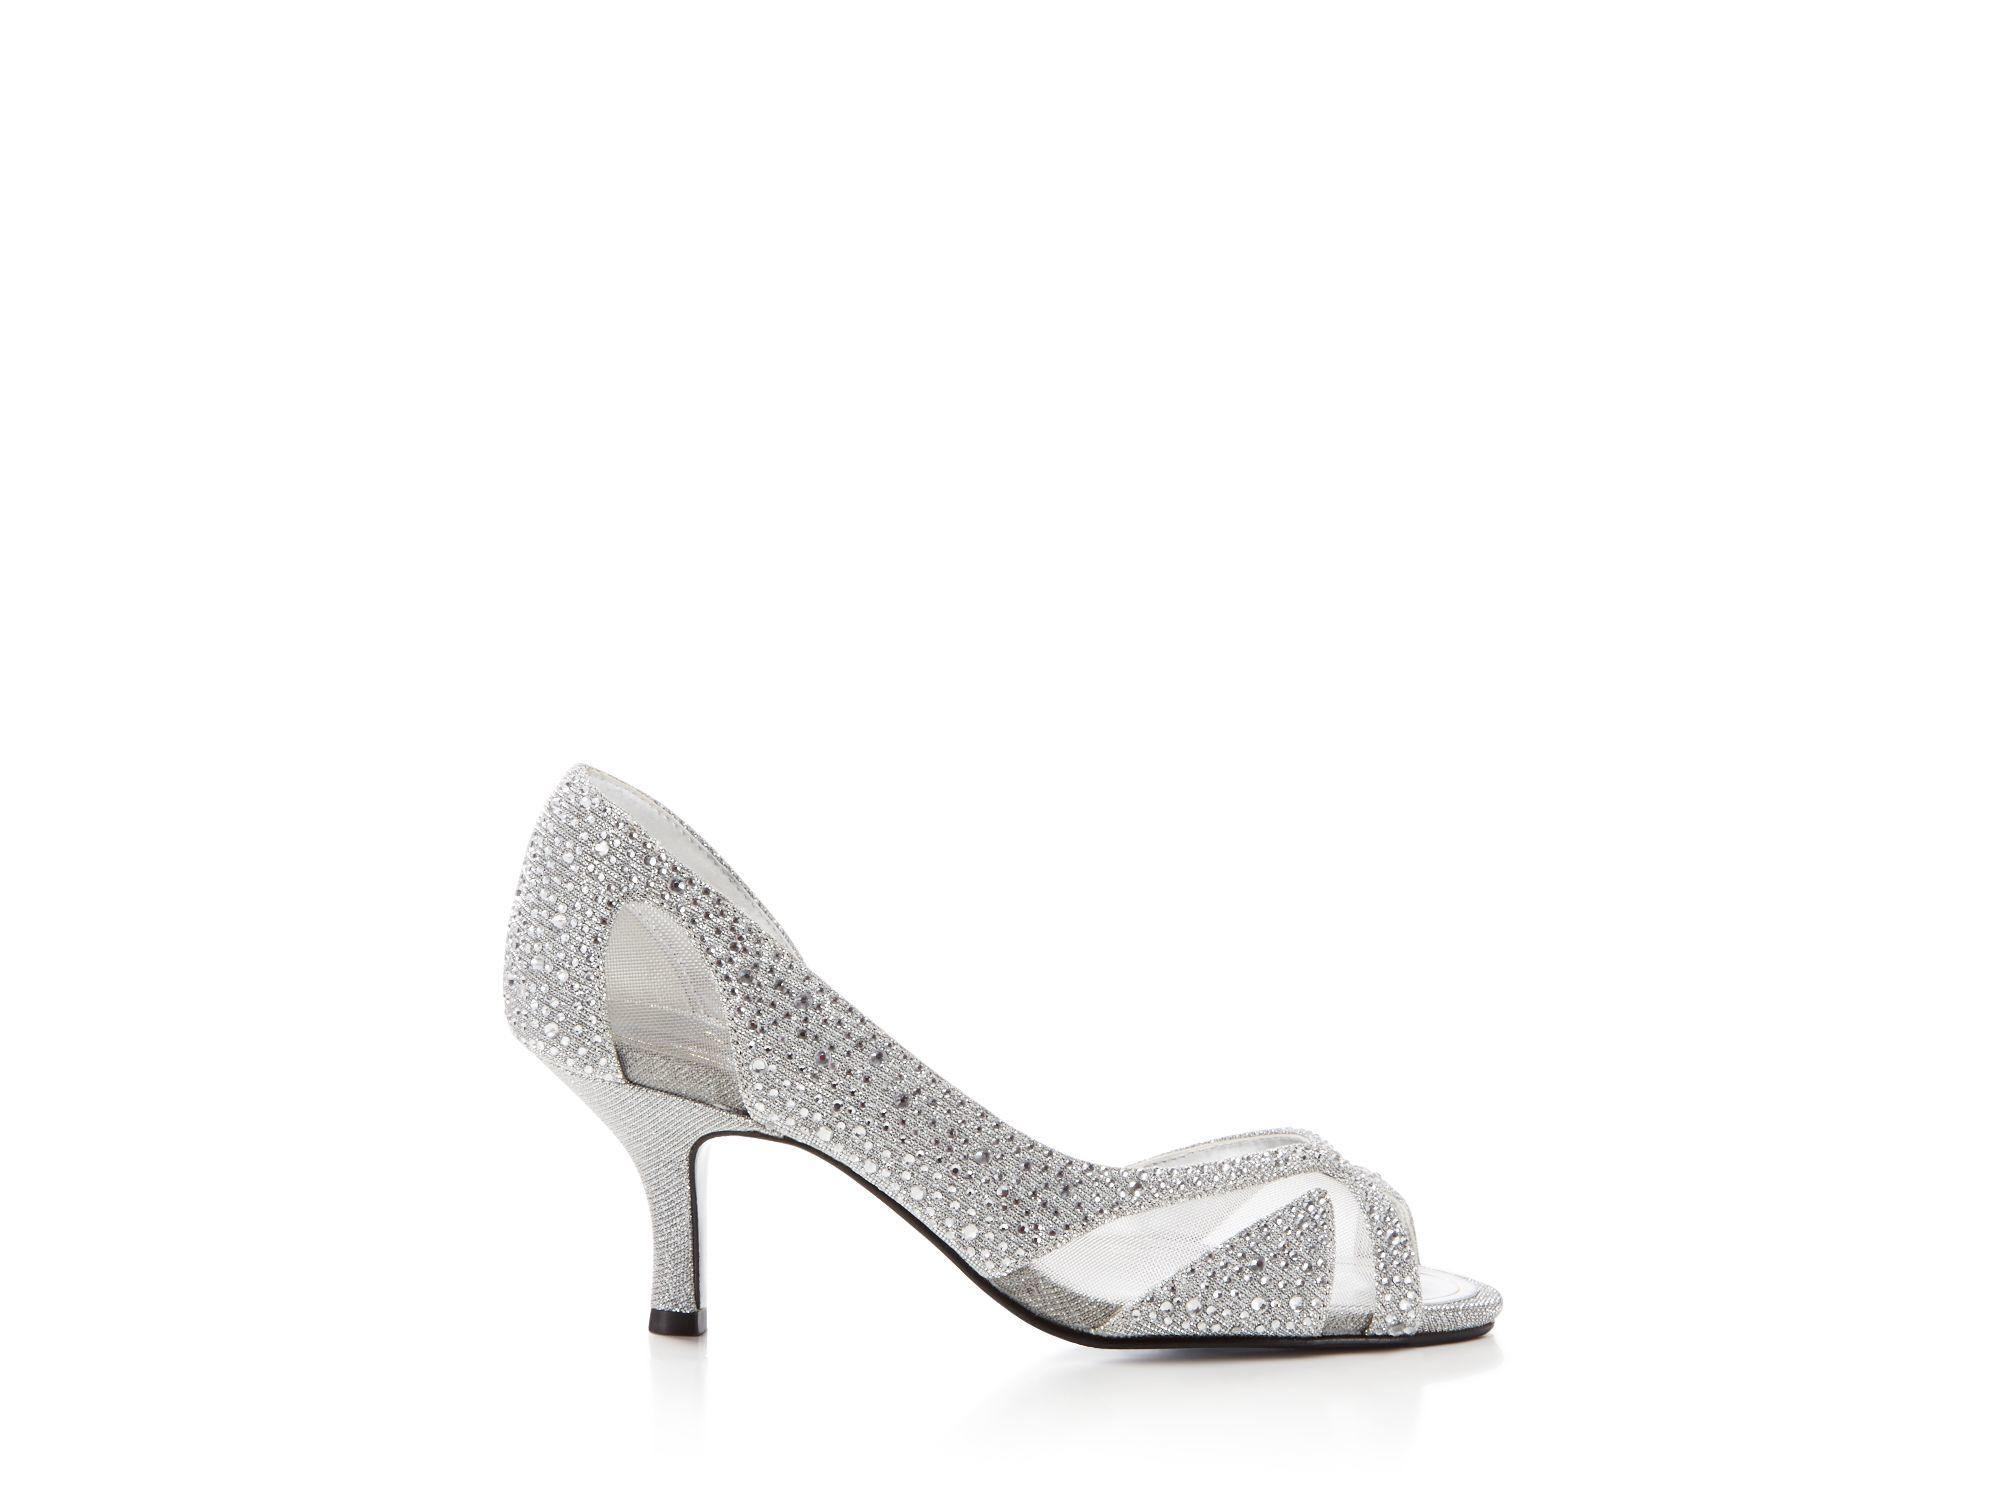 Lyst - Caparros Zofia Peep Toe Mid Heel Pumps in Metallic